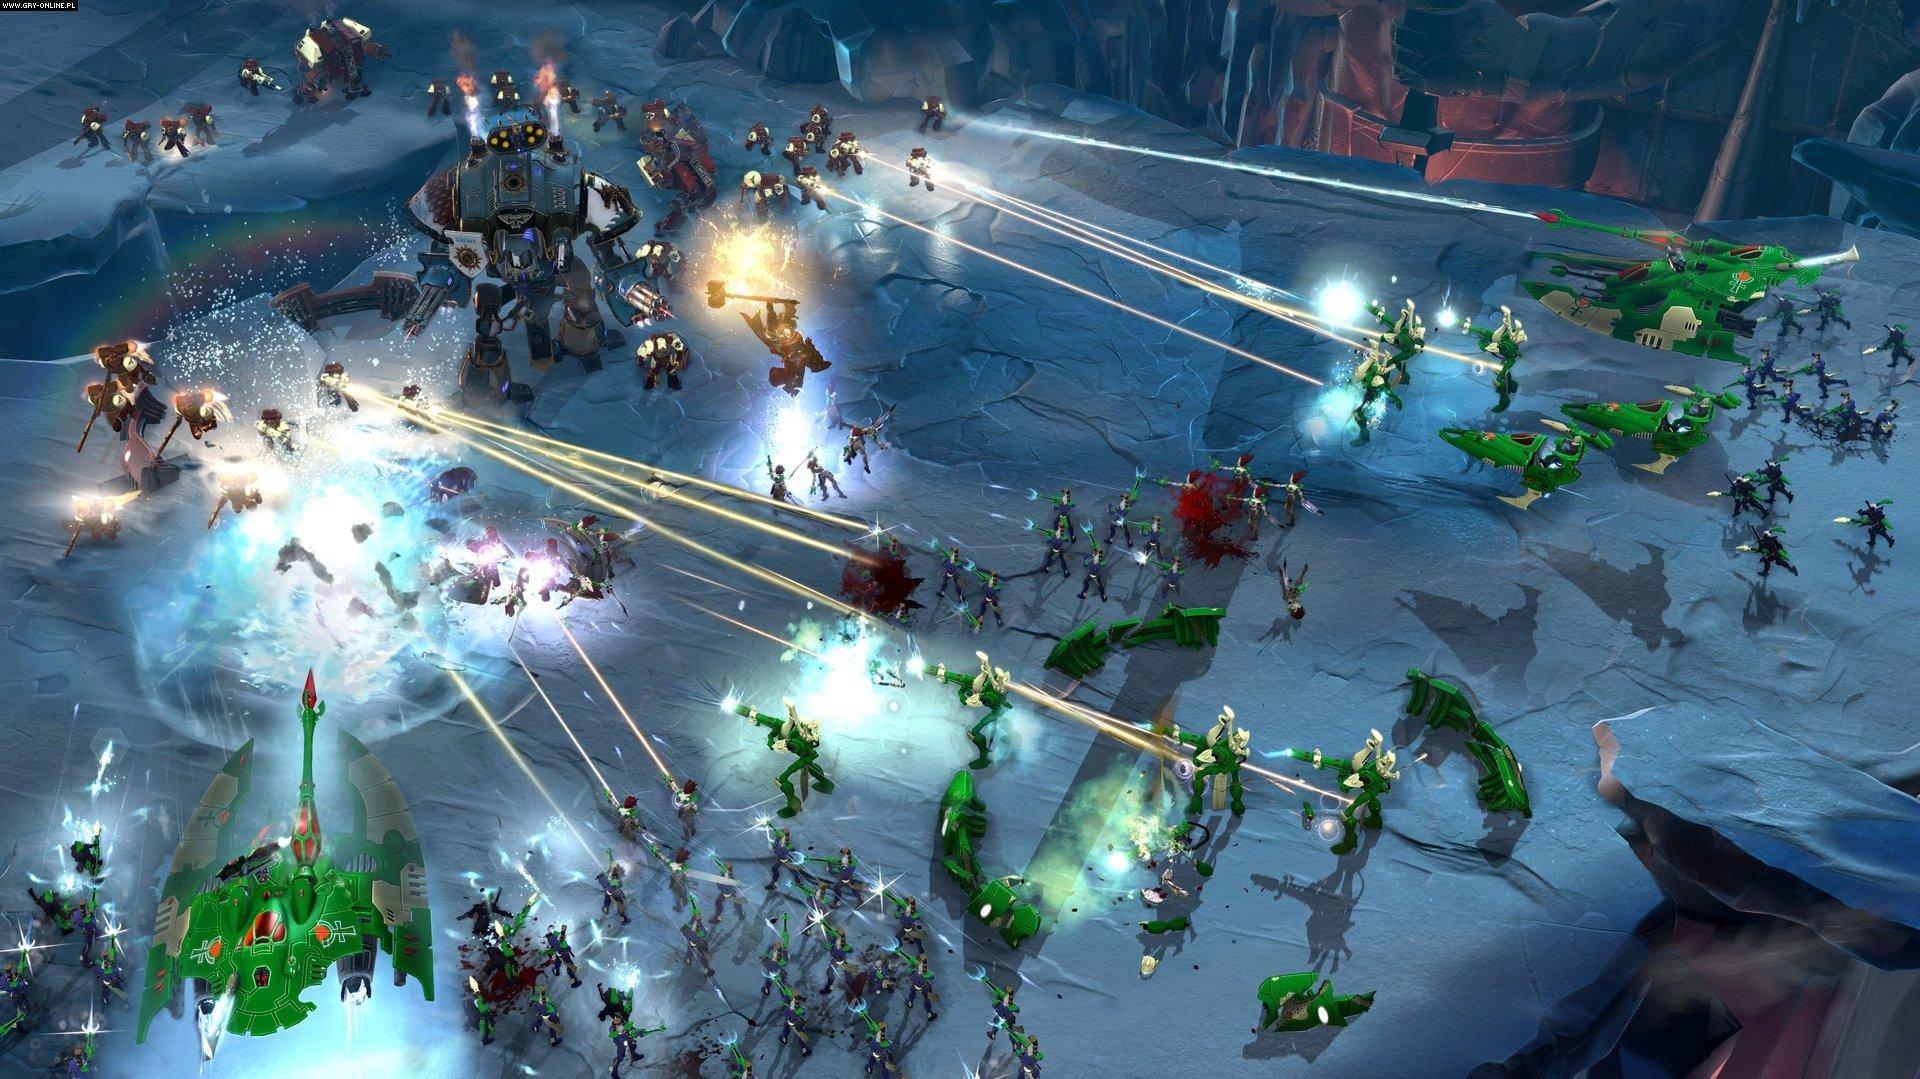 Warhammer 40,000: Dawn of War III PC Games Image 32/32, Relic Entertainment, SEGA